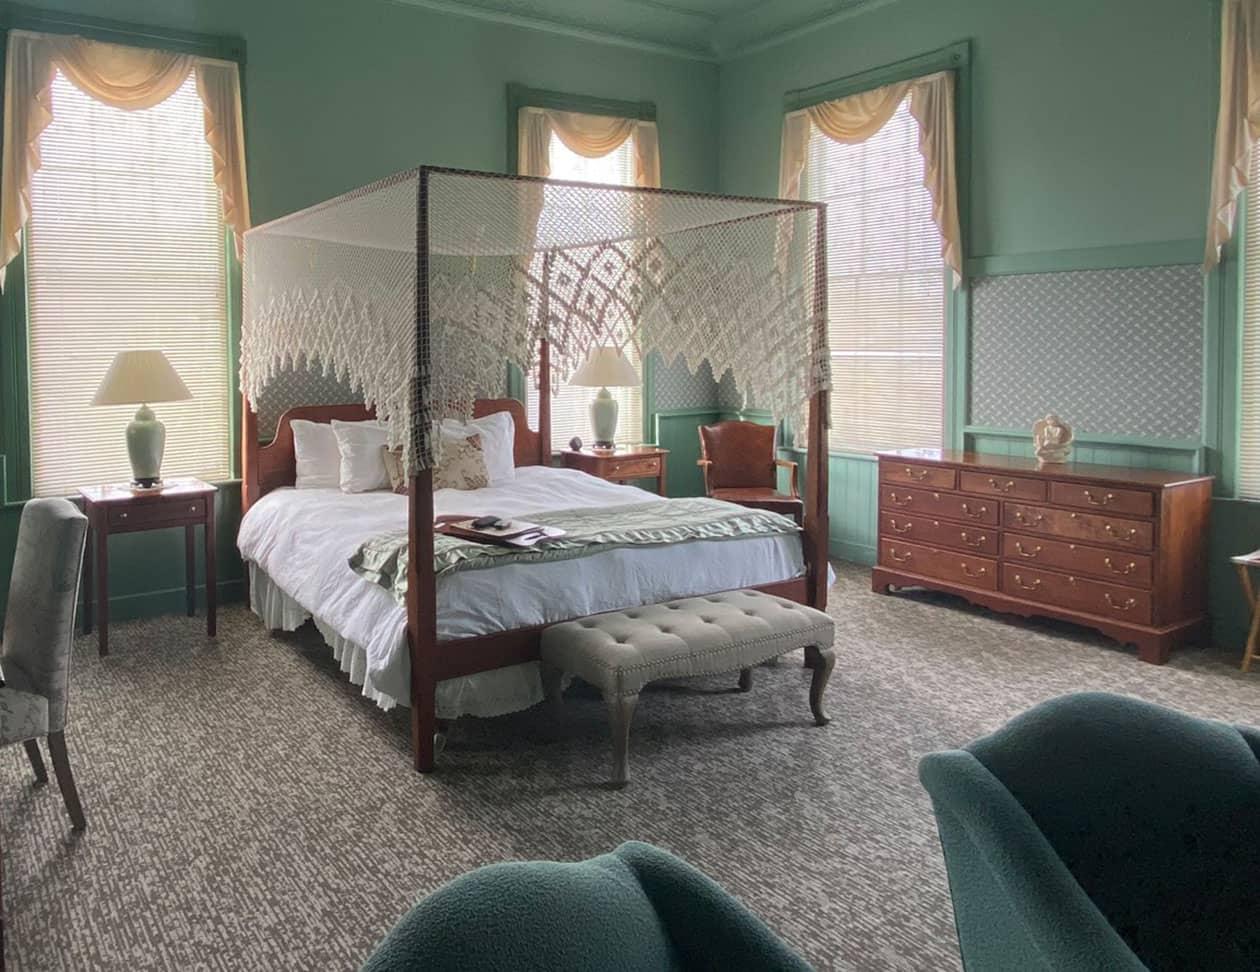 The La Normandie Room at sunset - B&B near Lenox